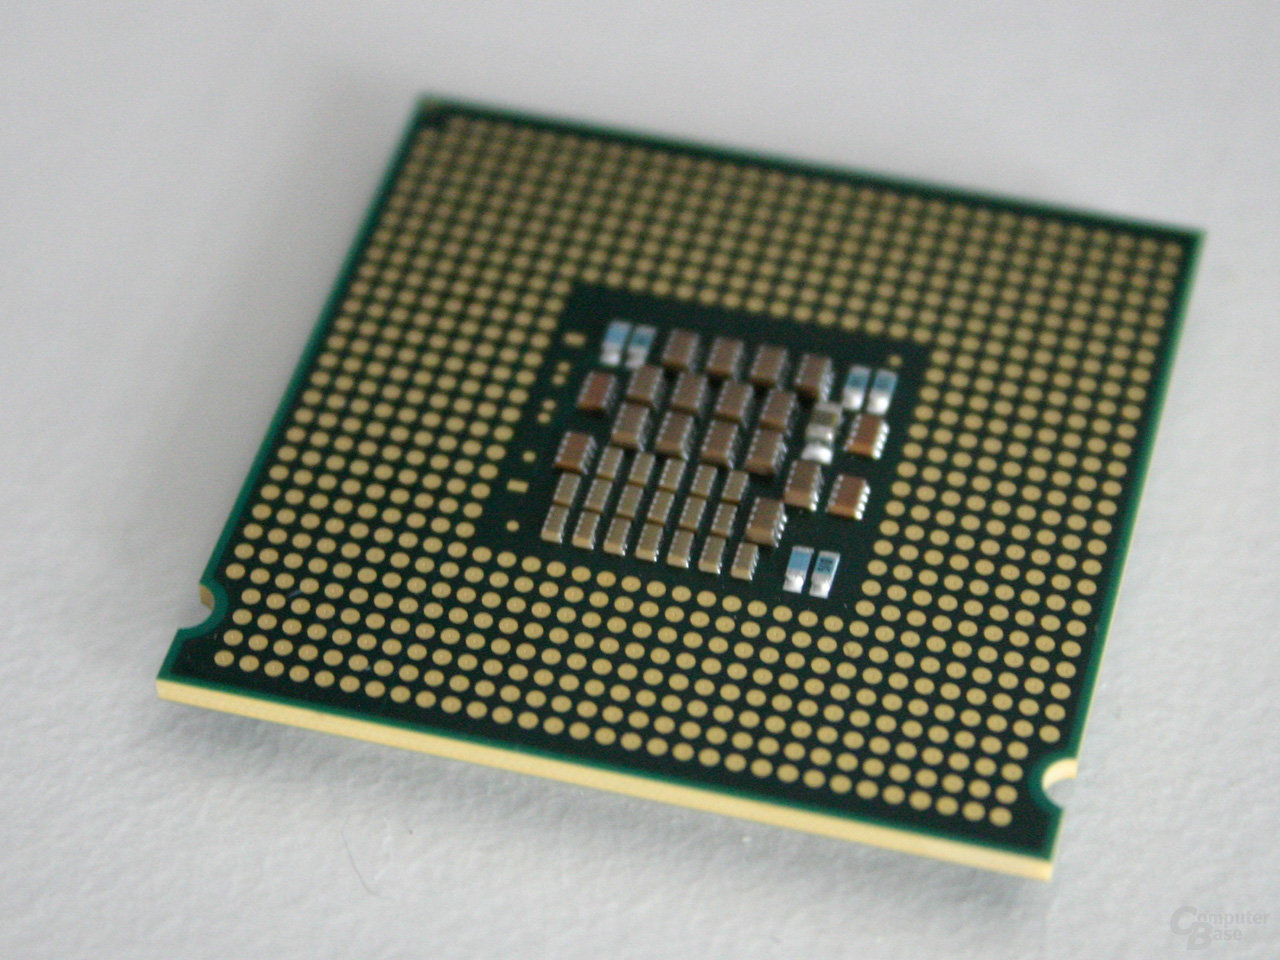 Intel Xeon 5000-Serie (Dempsey) mit Sockel 771